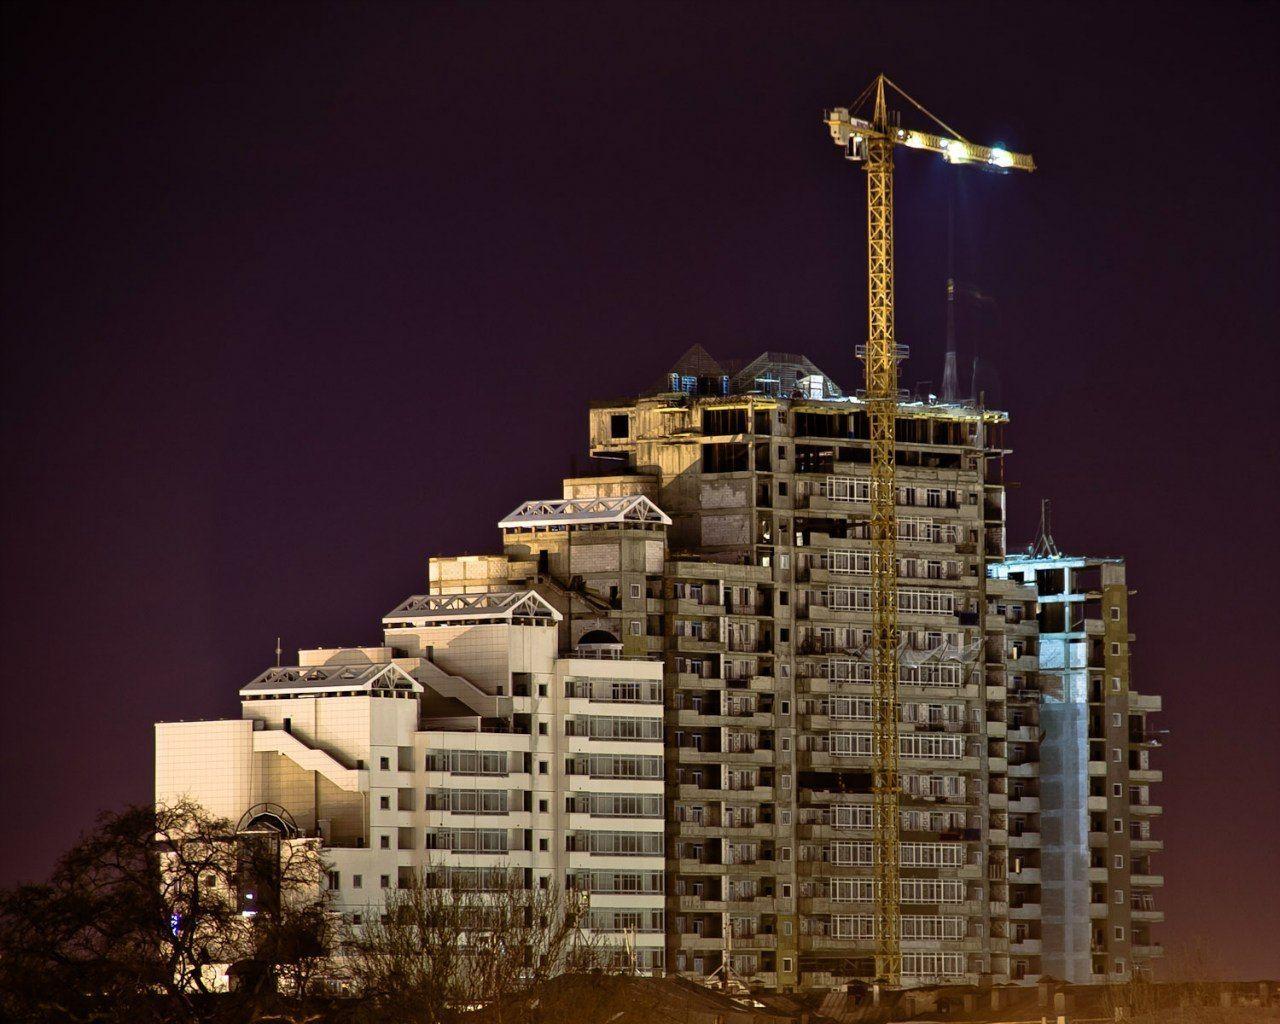 Construction Construction Work TOWNSCAPE Light Town Buildings Architecture дом Чижа Belarus Minsk Bulding Night